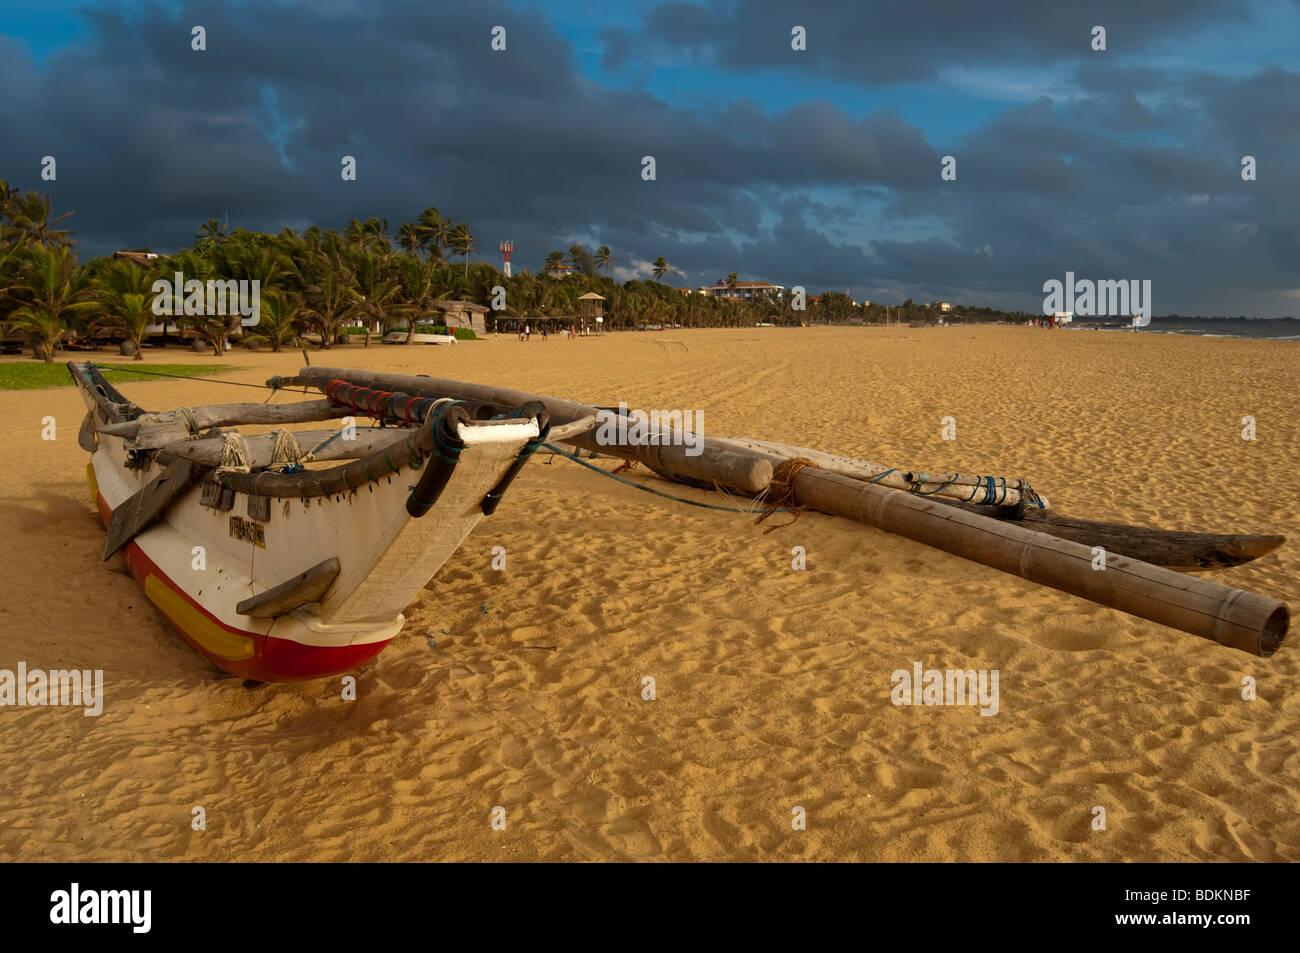 Traditional Fishing Boat Sri Lanka on beach rain storm clouds in background Stock Photo